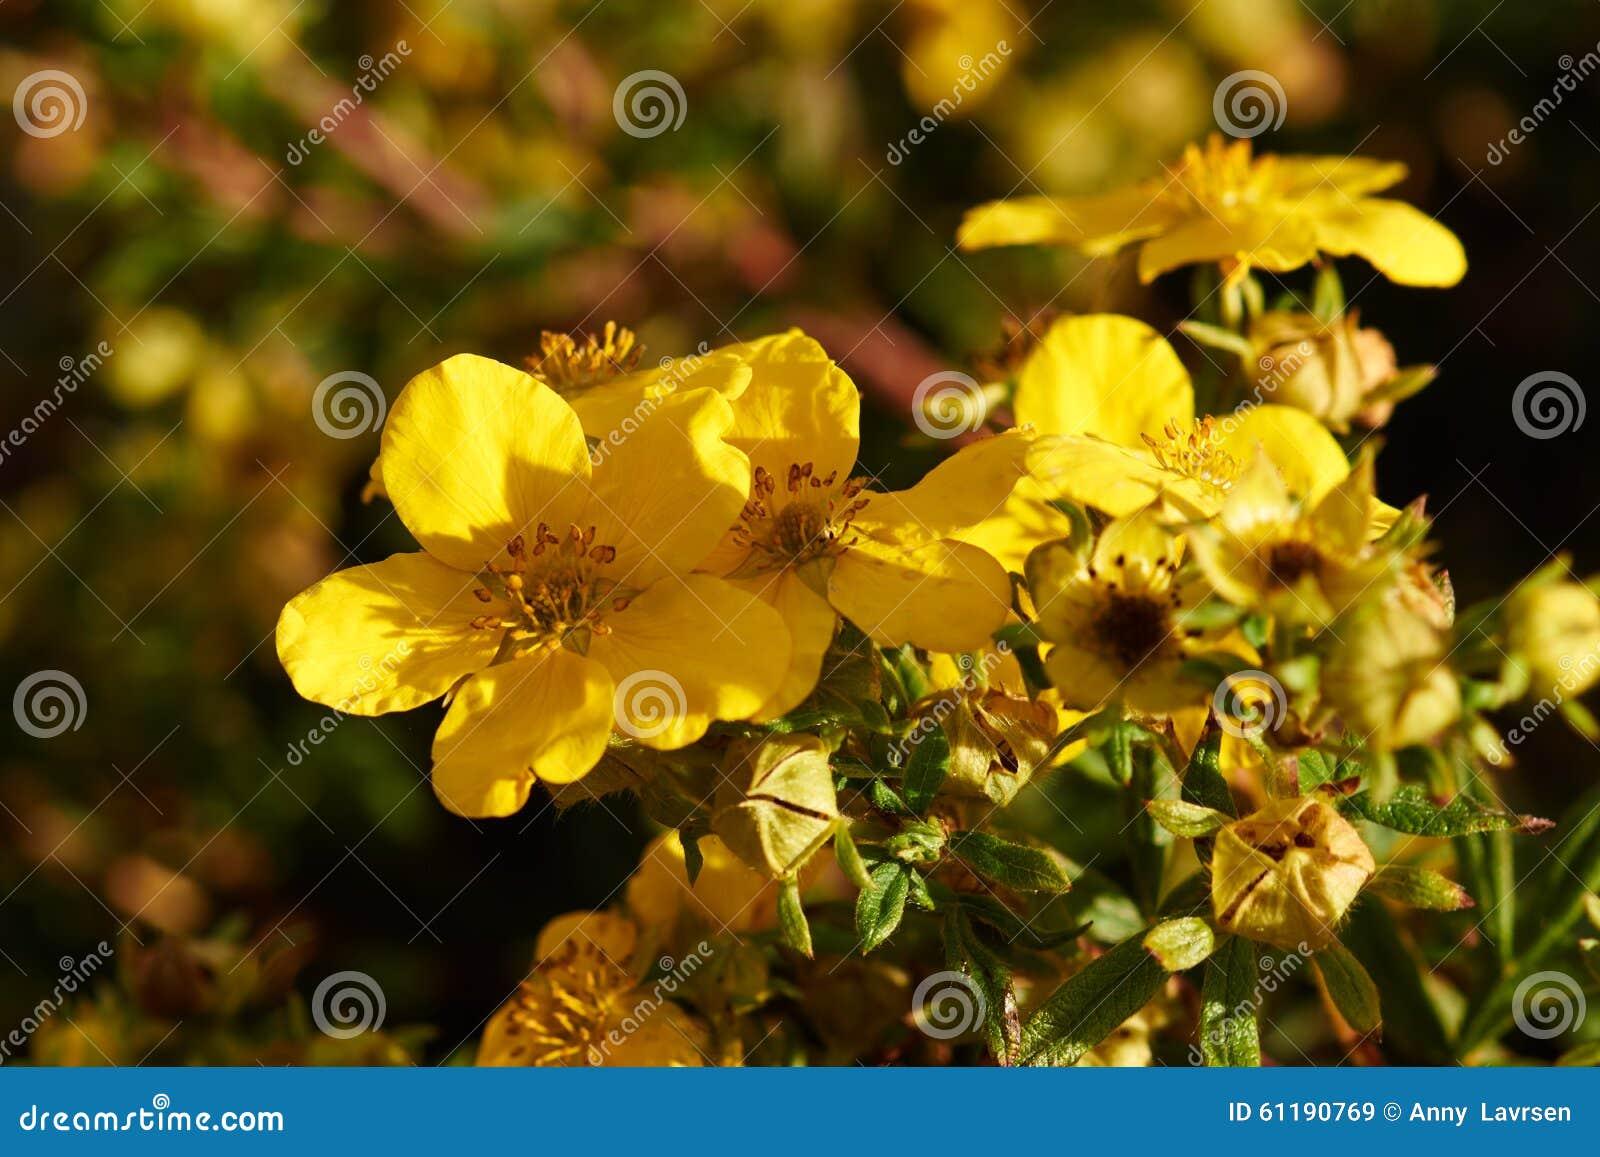 Yellow flowers on potentilla bush stock image image of denmark download yellow flowers on potentilla bush stock image image of denmark bush 61190769 mightylinksfo